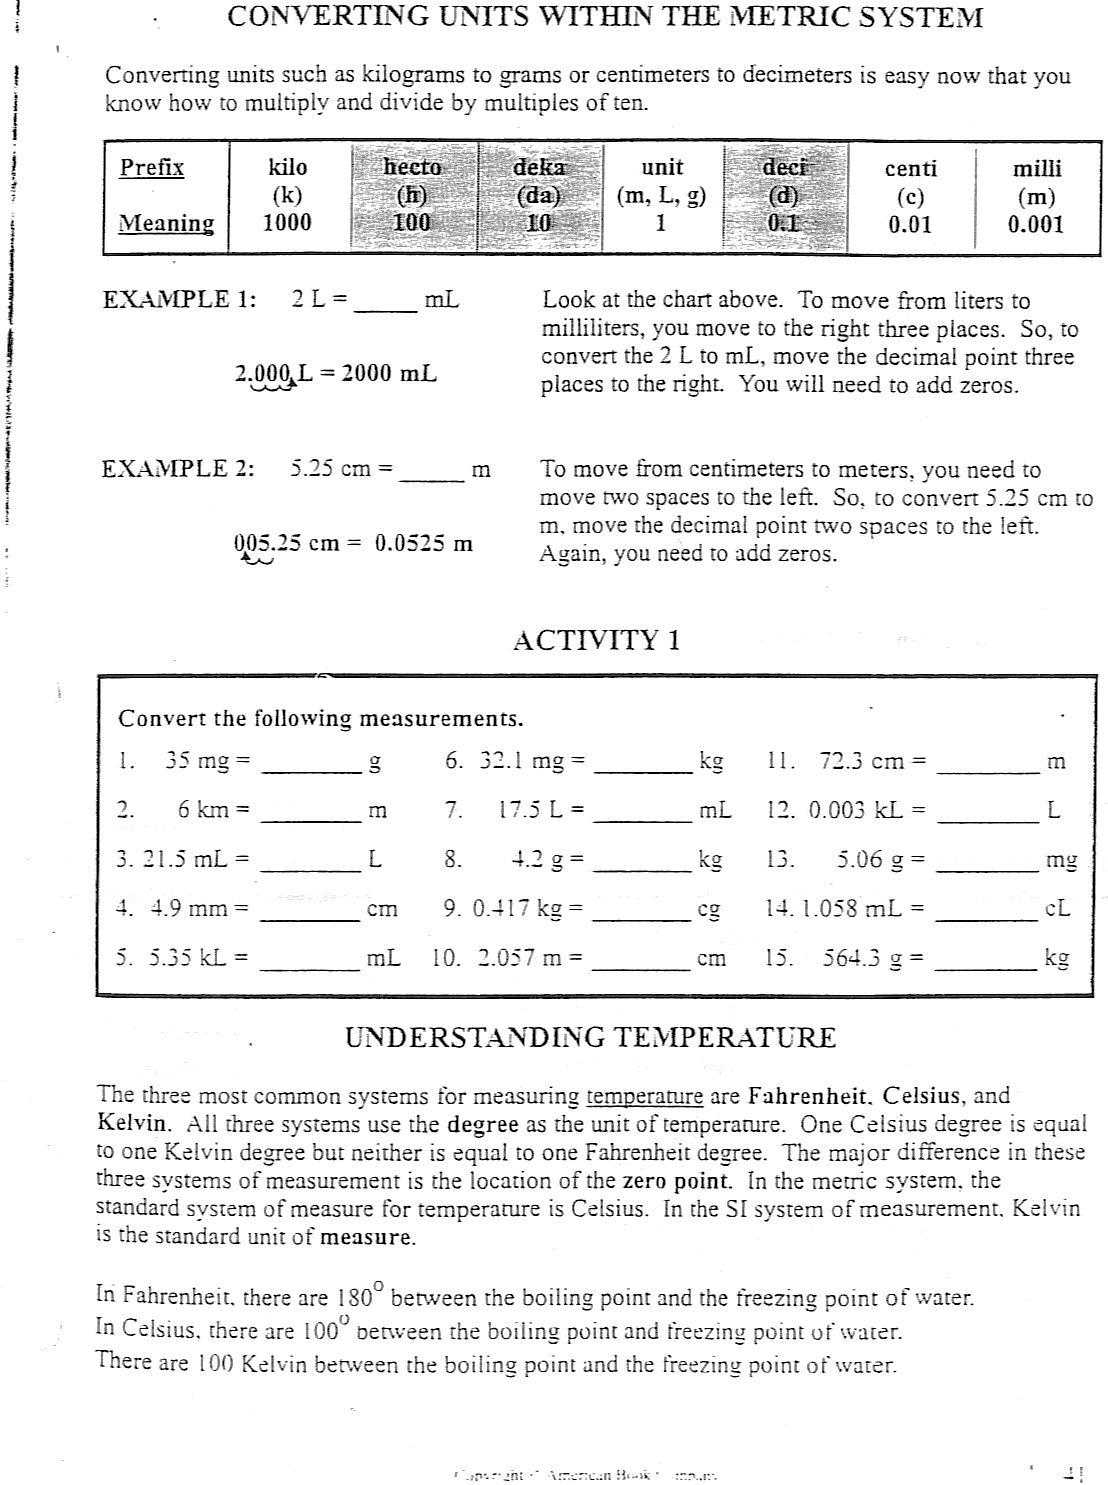 Metric System Worksheet High School Worksheets For All